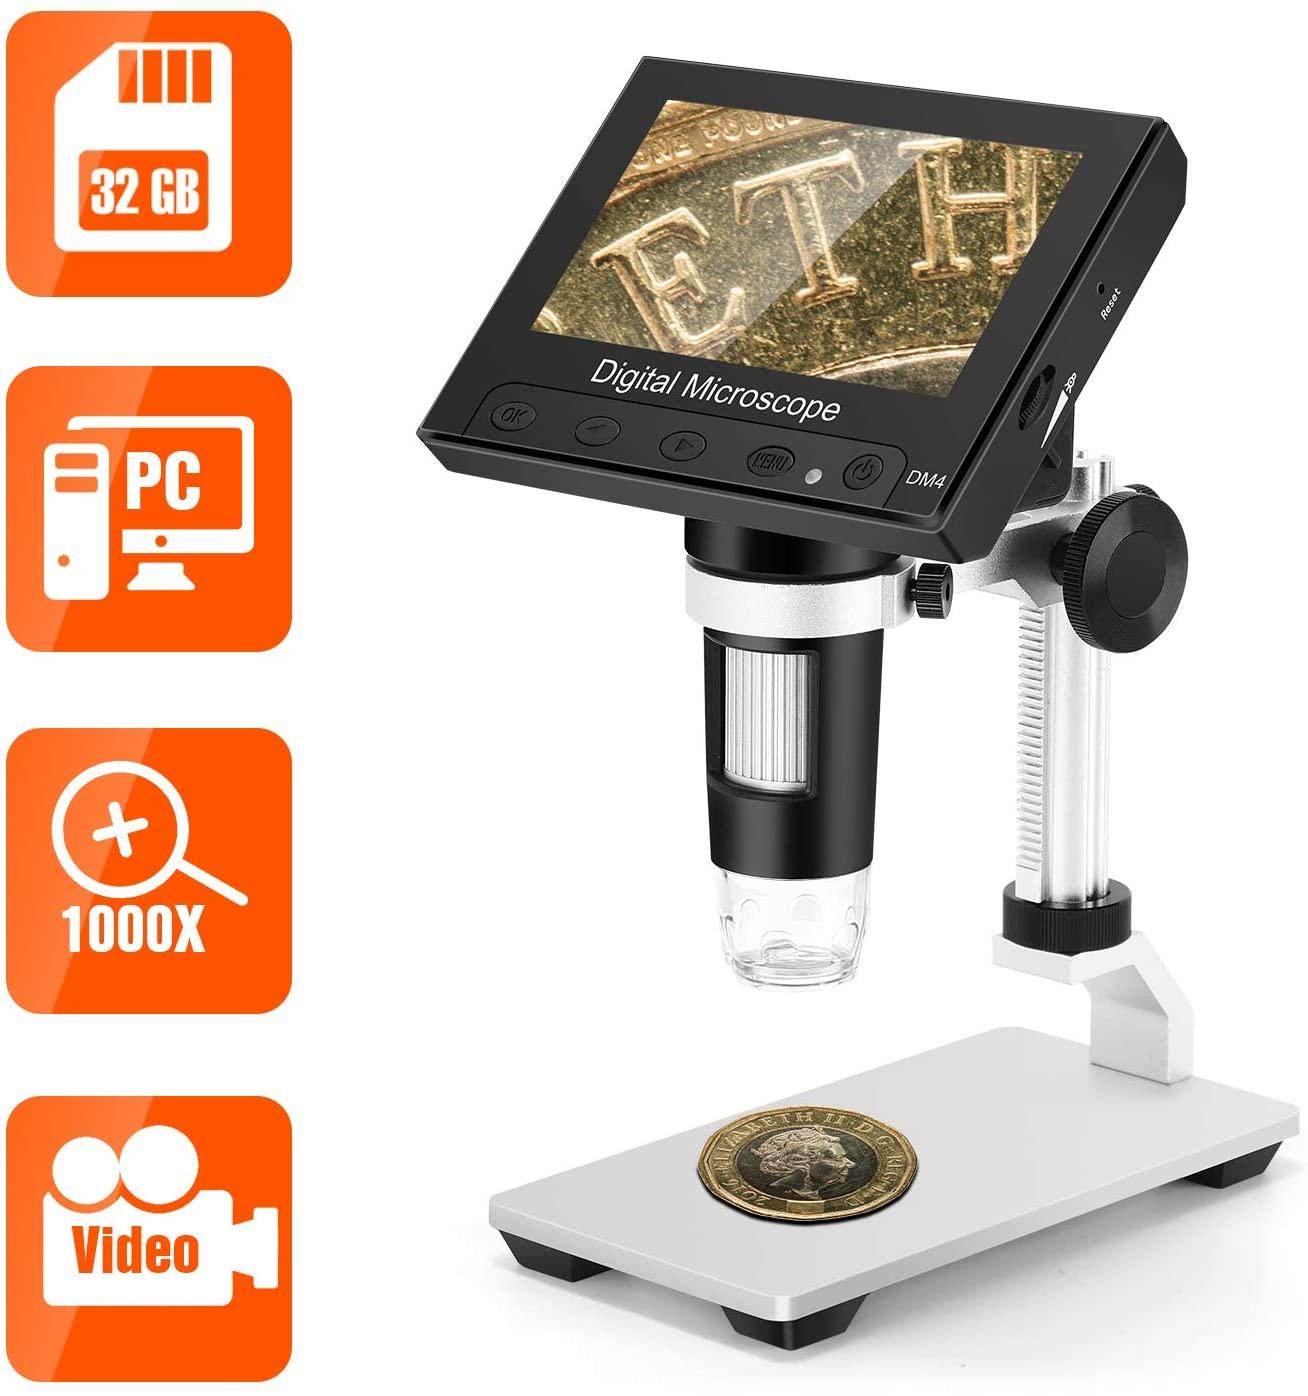 TOMLOV LCD Digital Microscope with 32GB SD Card, 4.3